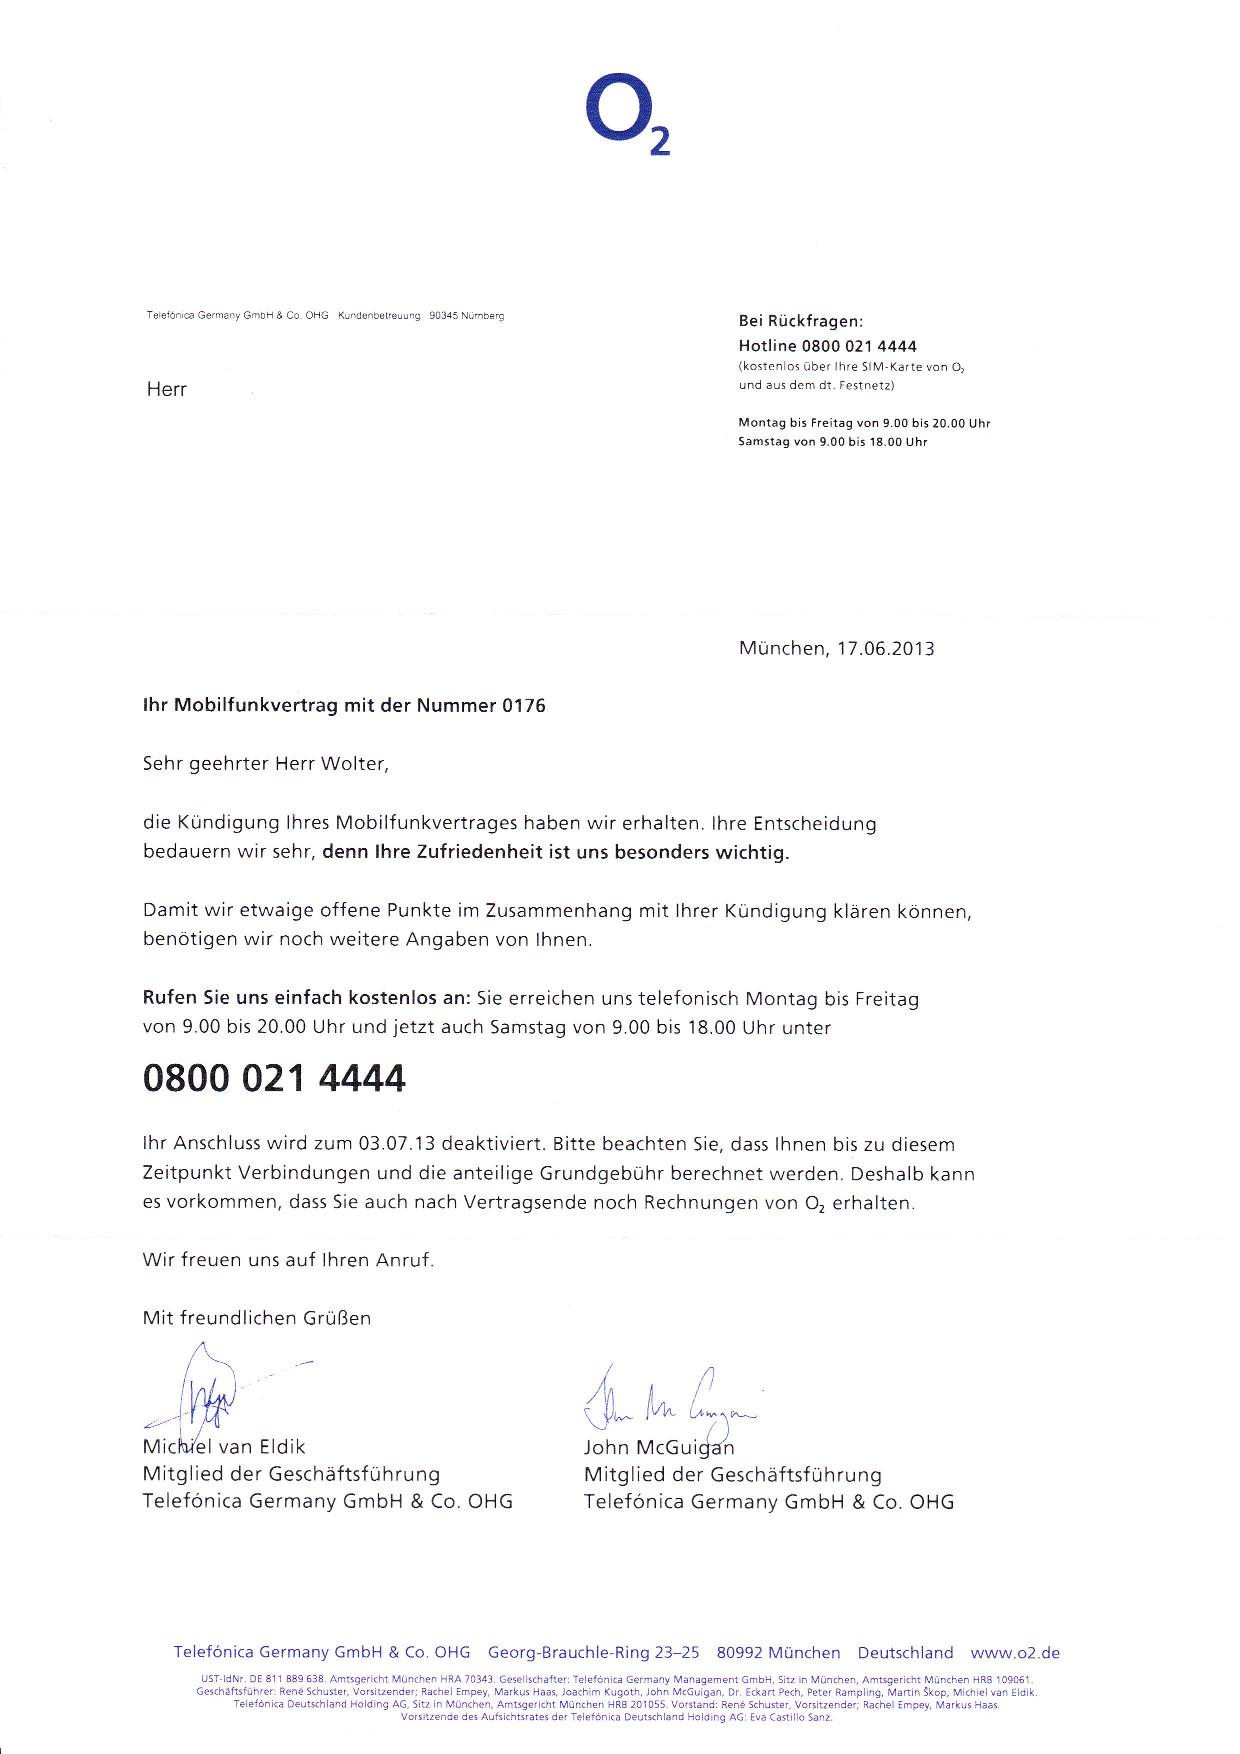 Kündigung per fax o2